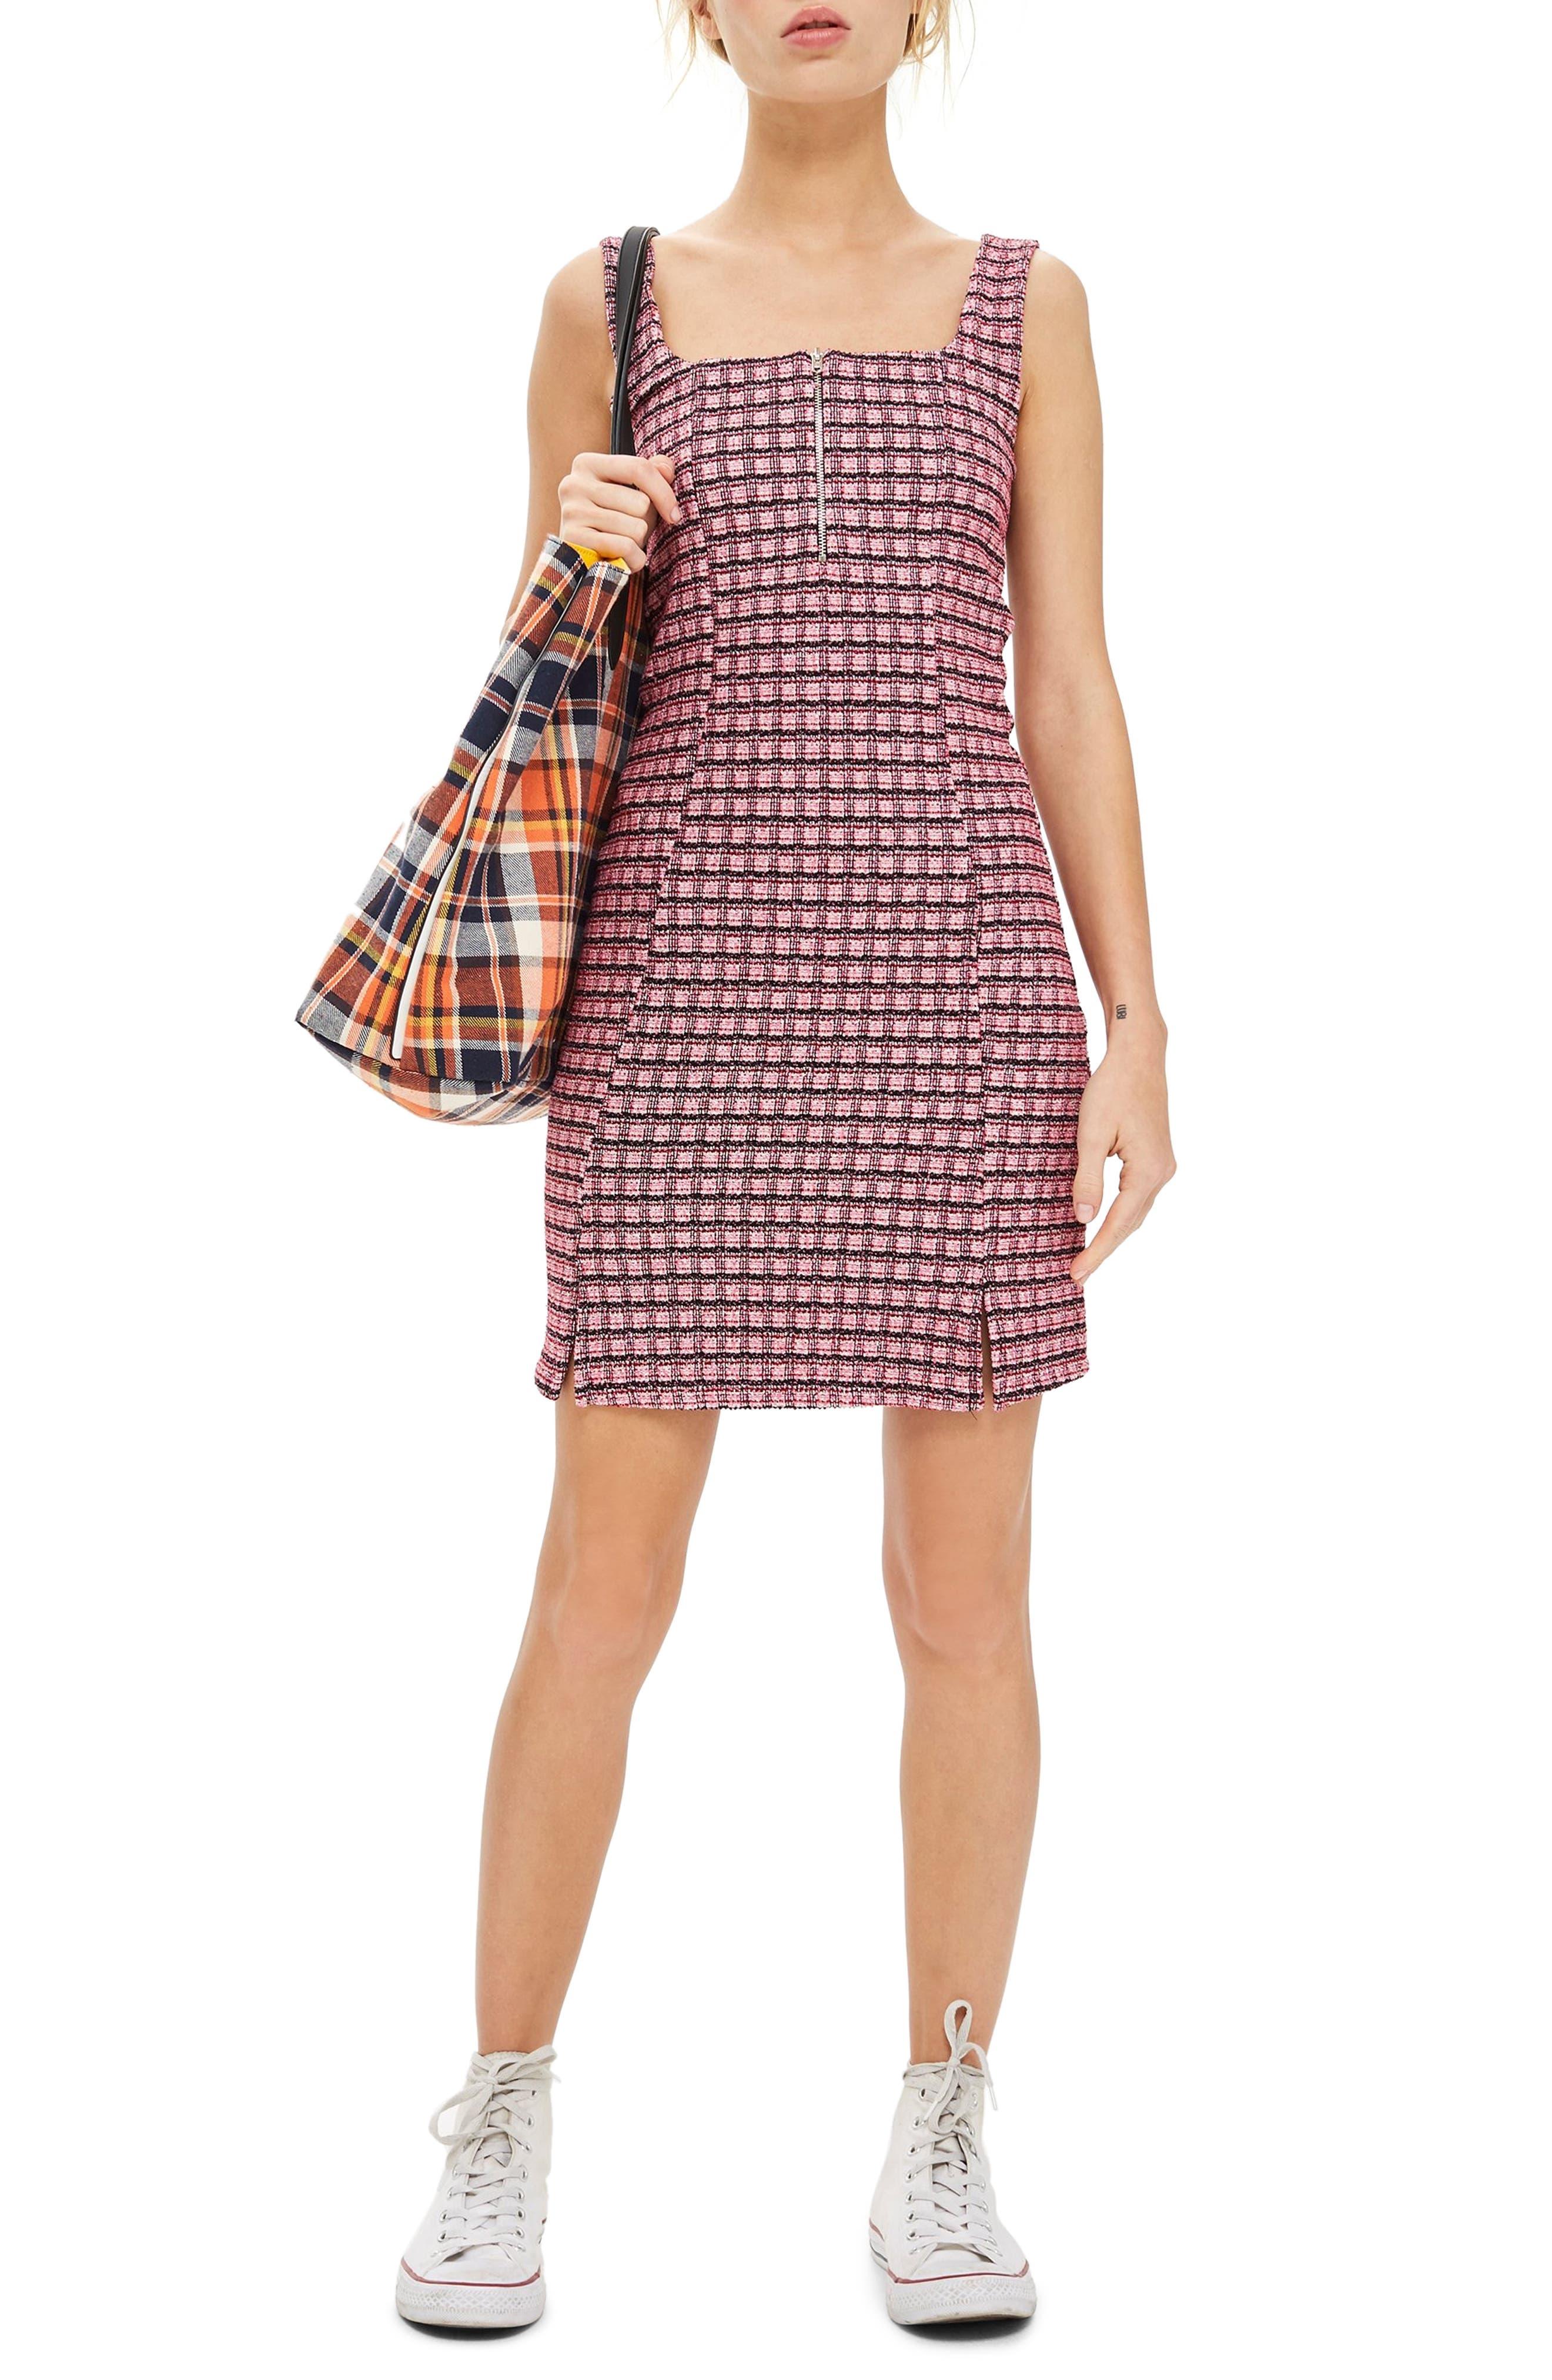 Topshop Mini Check Pinafore Dress, US (fits like 0) - Pink